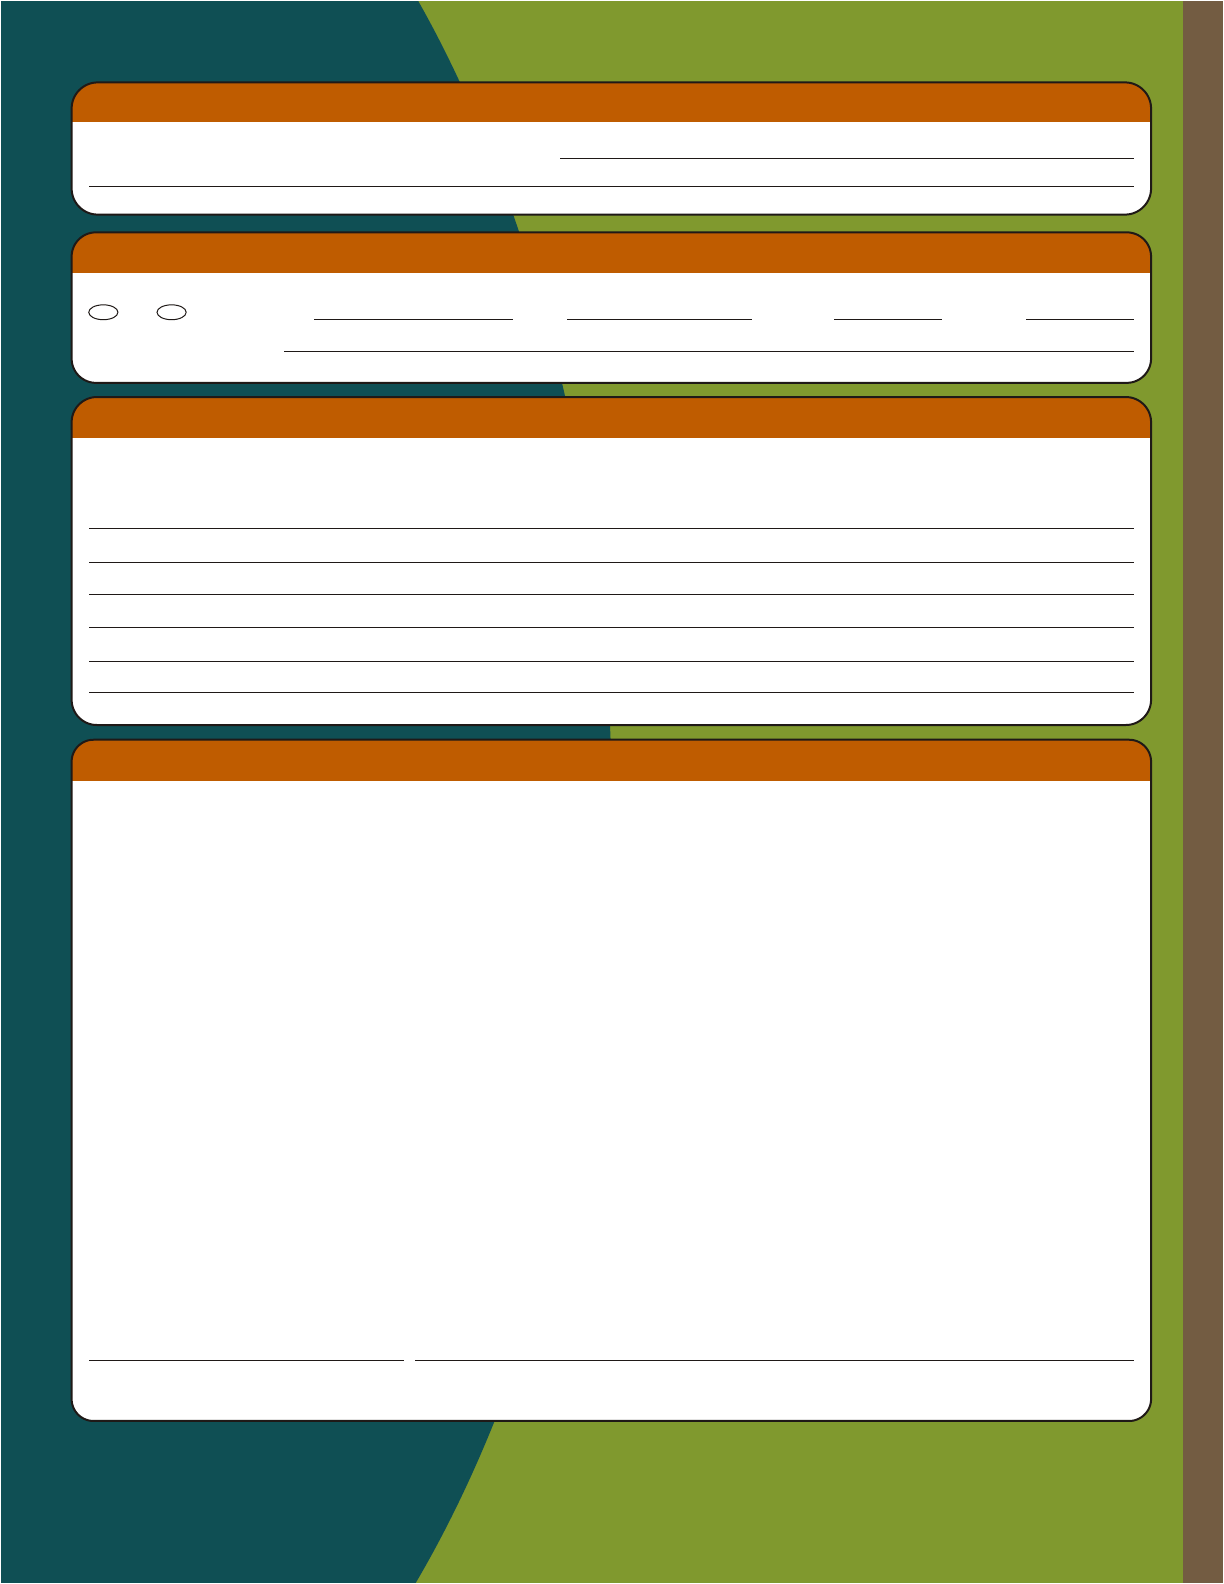 Free Printable Chick Fil A Job Application Form Page 2